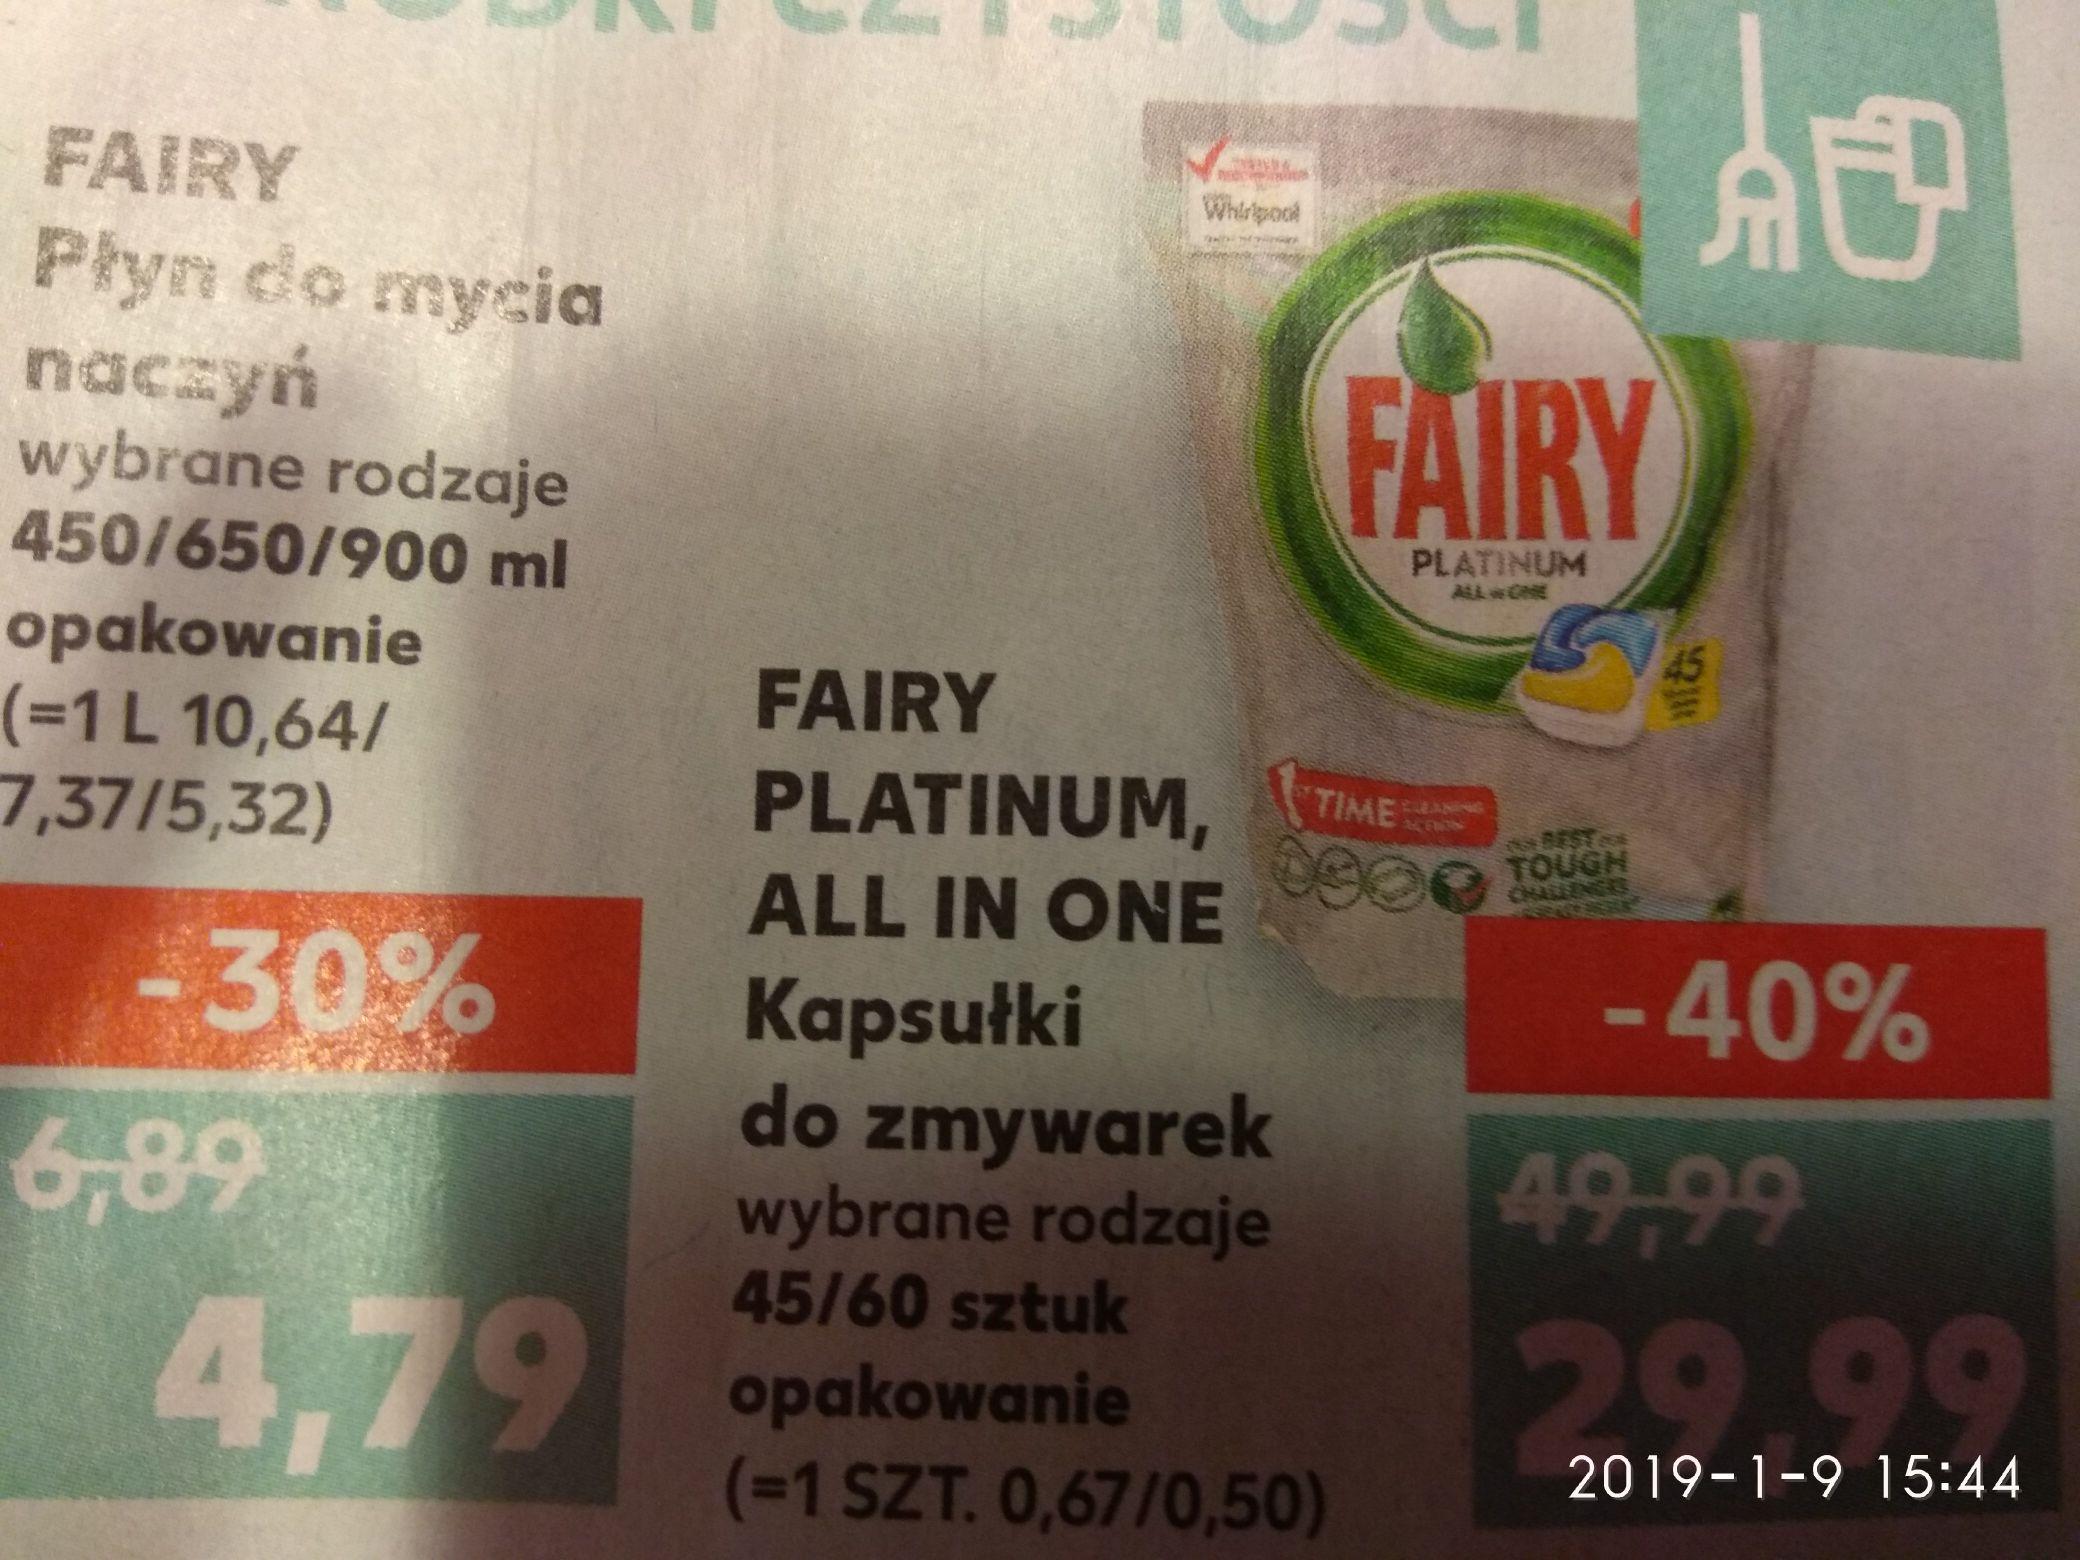 Fairy tabletki do zmywarki all in one, platinum Kaufland